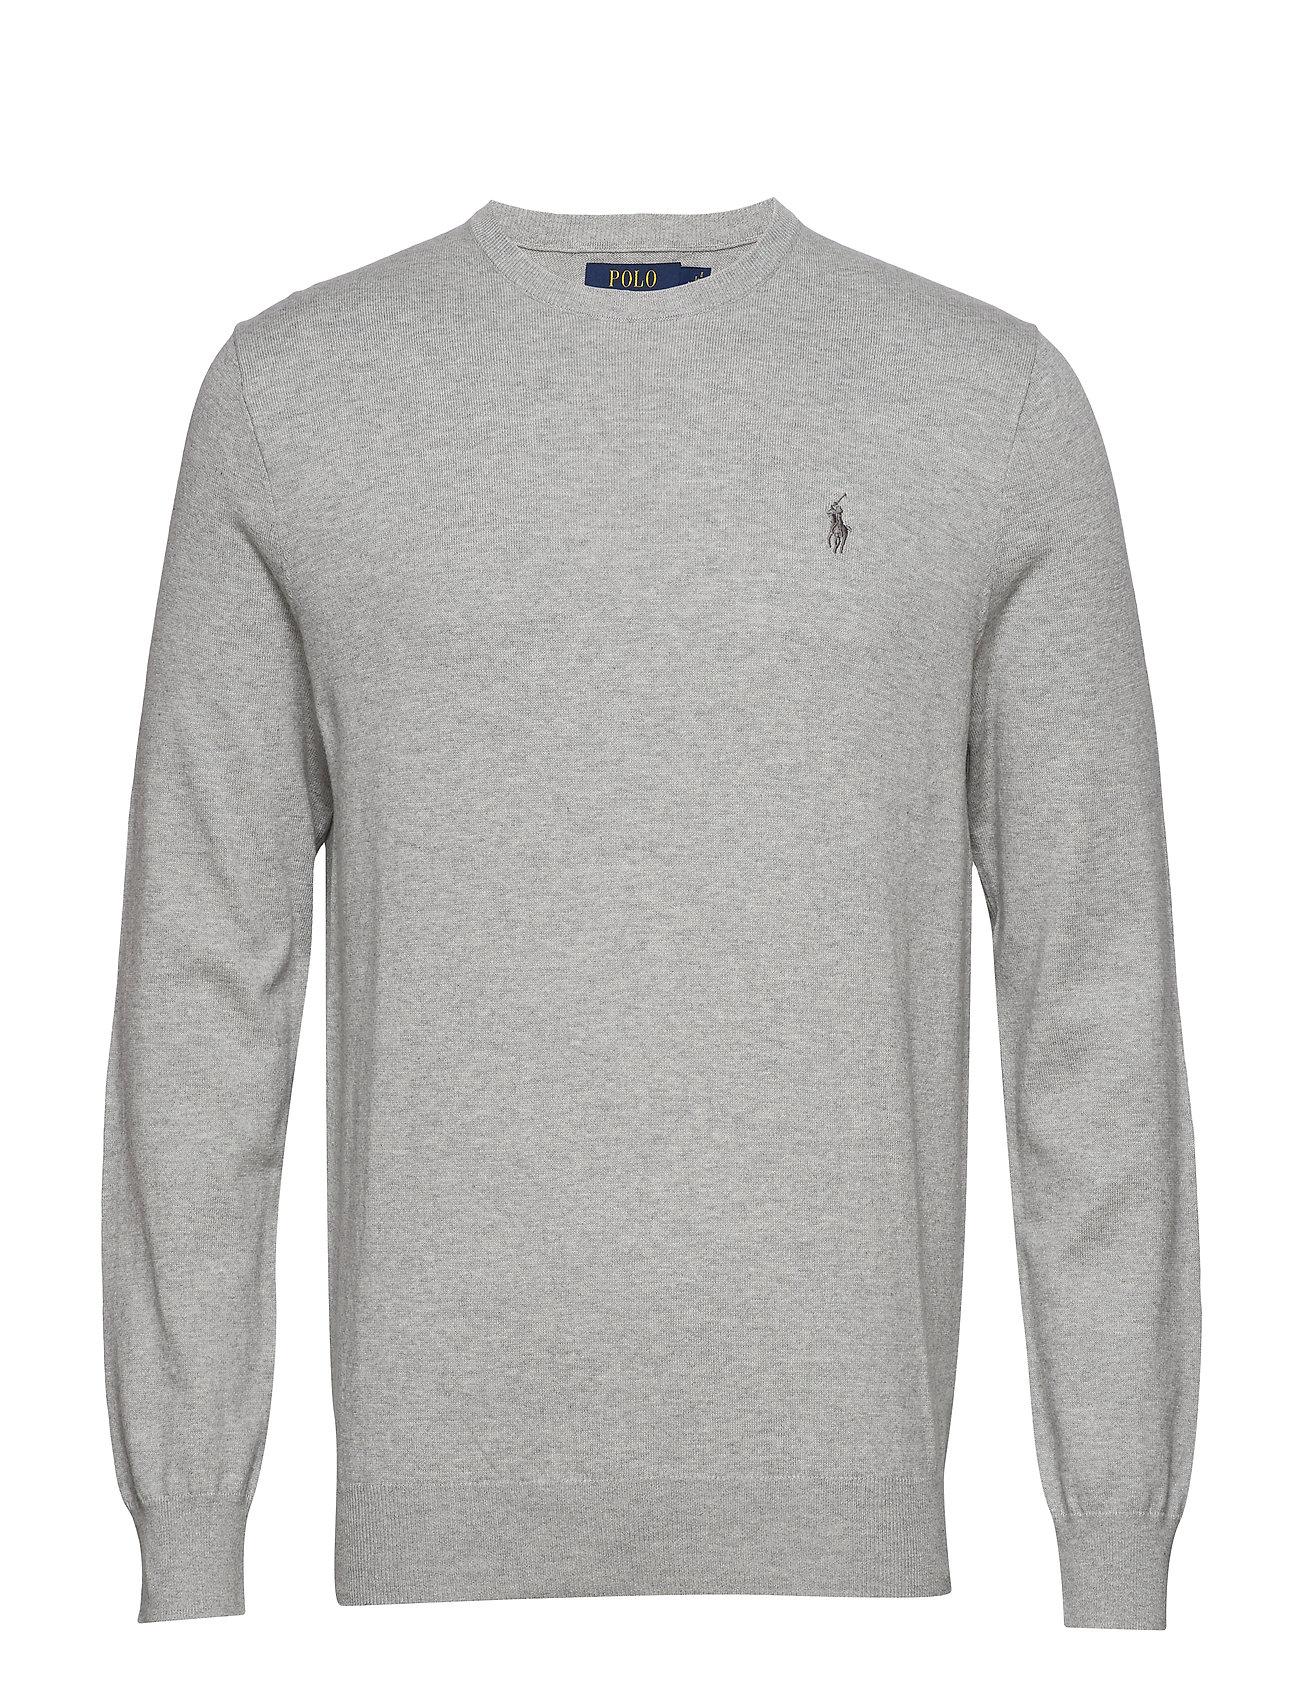 Polo Ralph Lauren Slim Fit Cotton Sweater - ANDOVER HEATHER